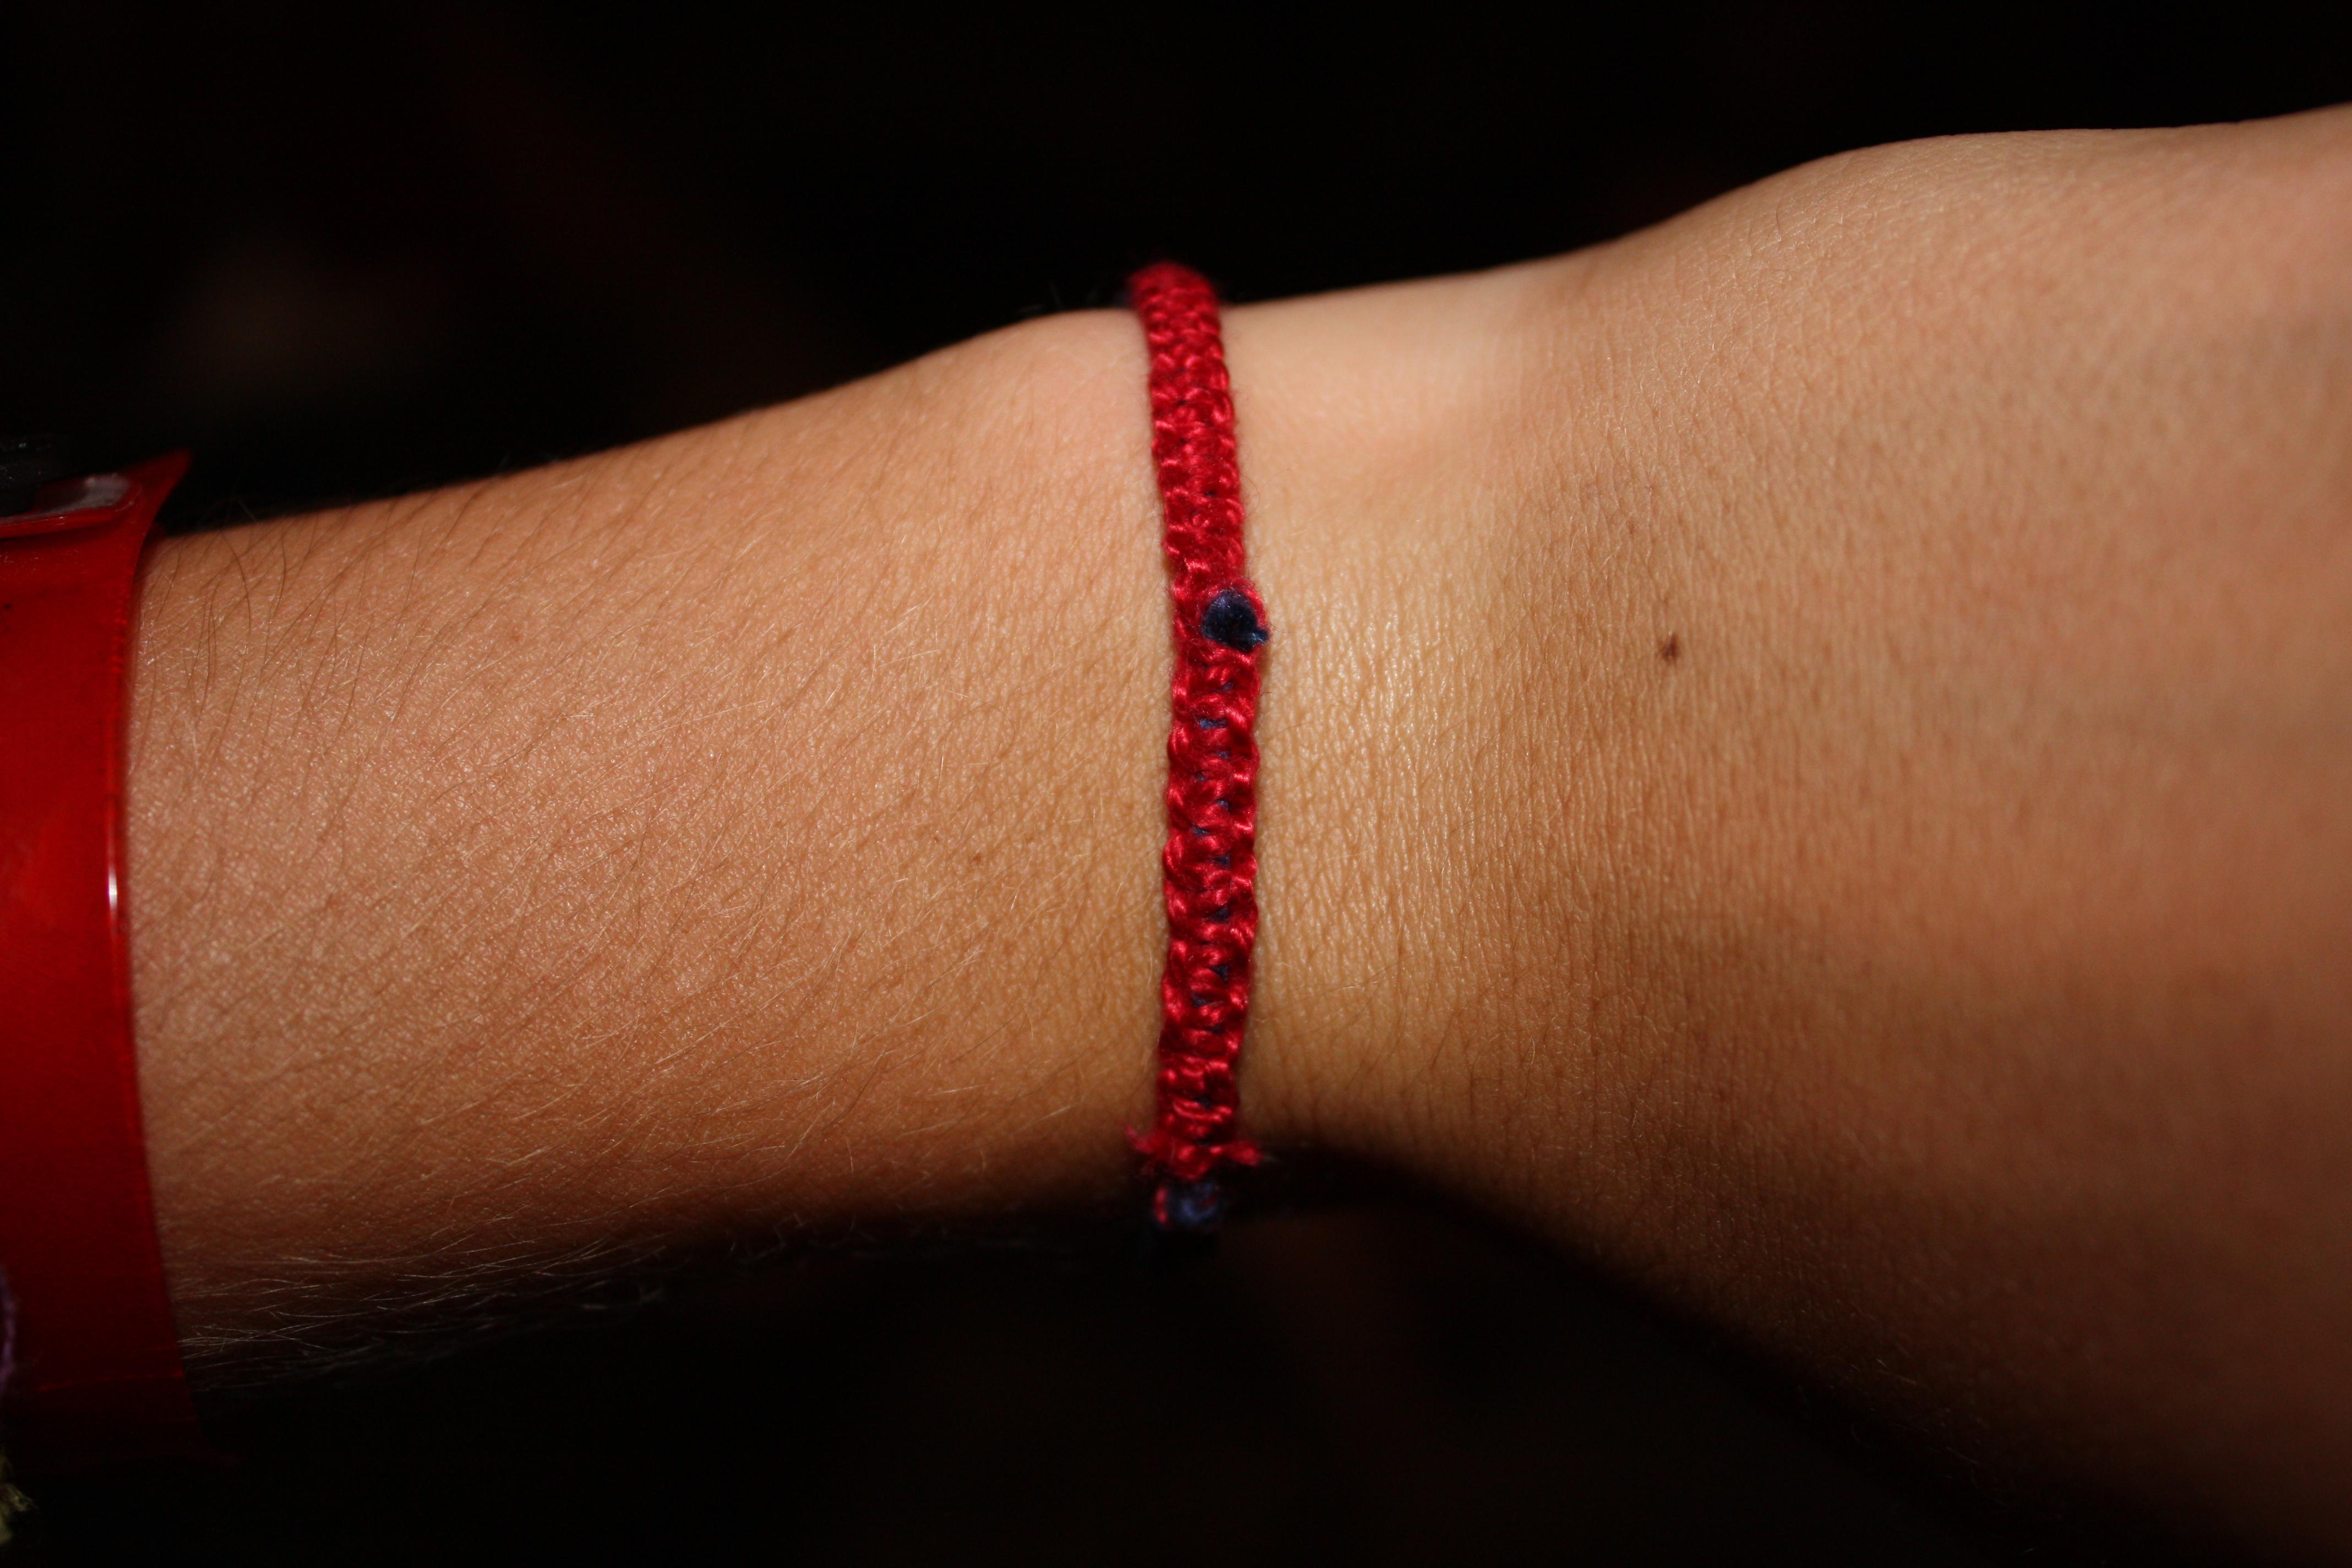 How to Make a Macrame [mak-ruh-mey] Bracelet